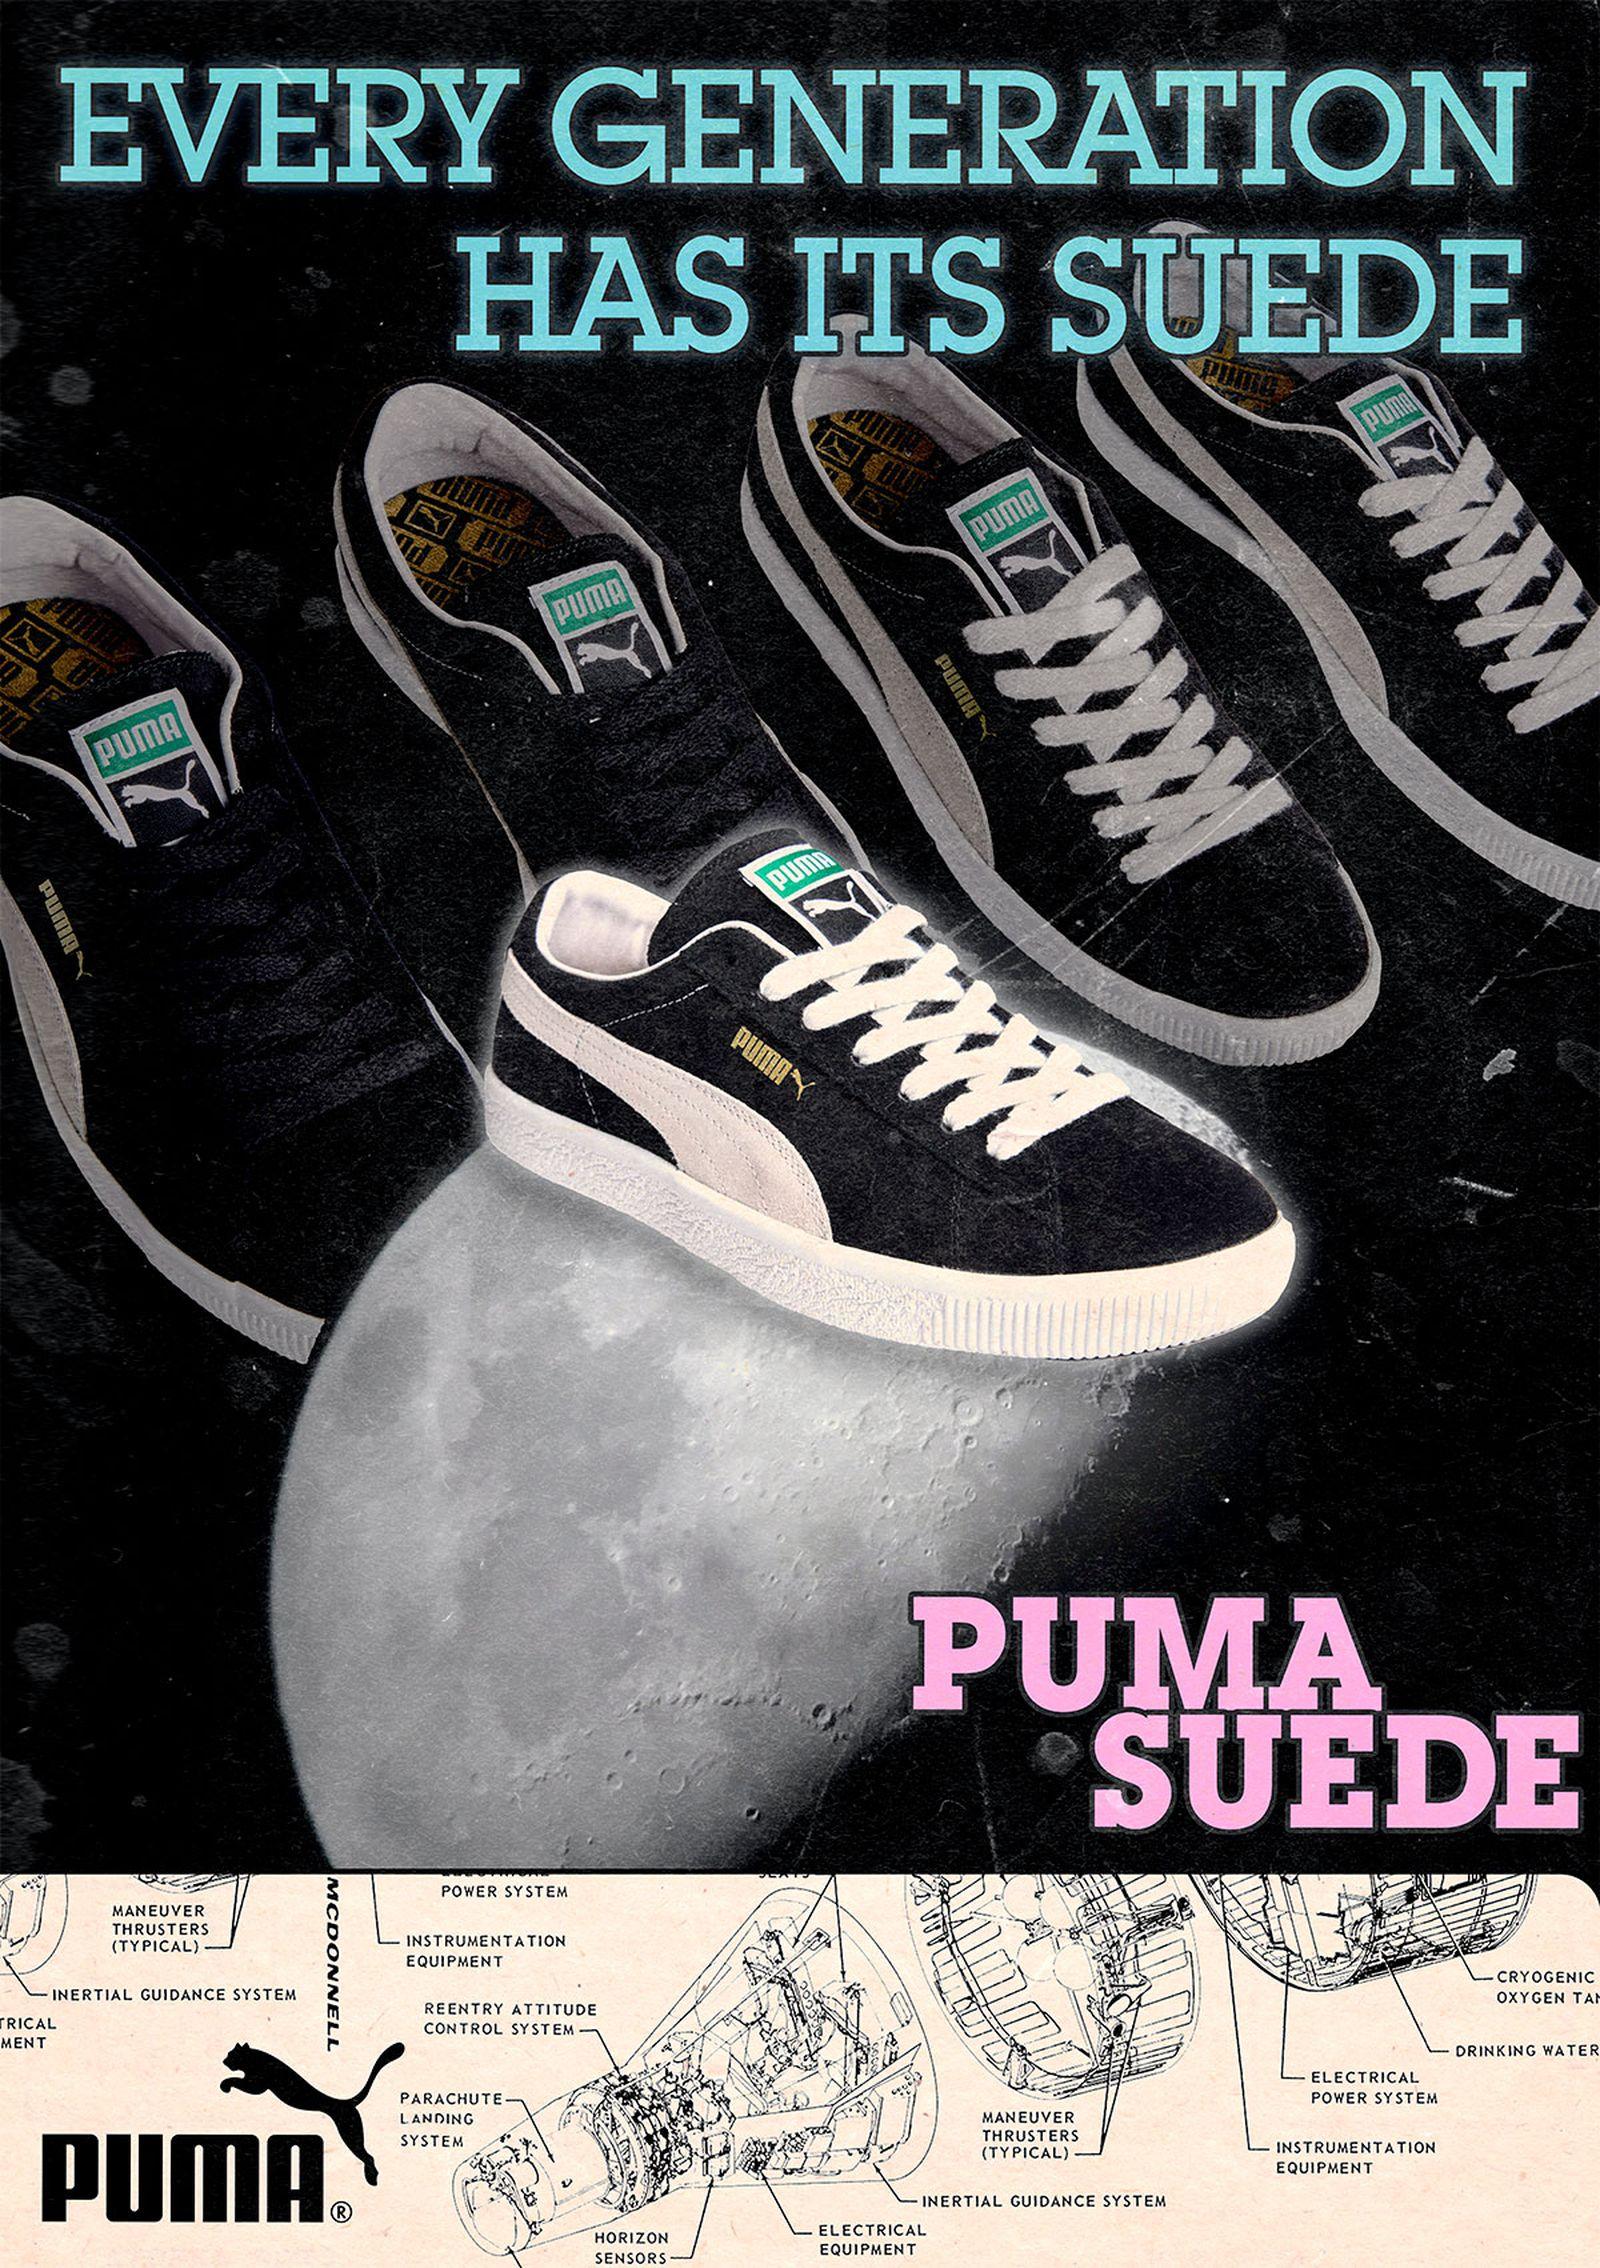 puma-suede-history-main-2